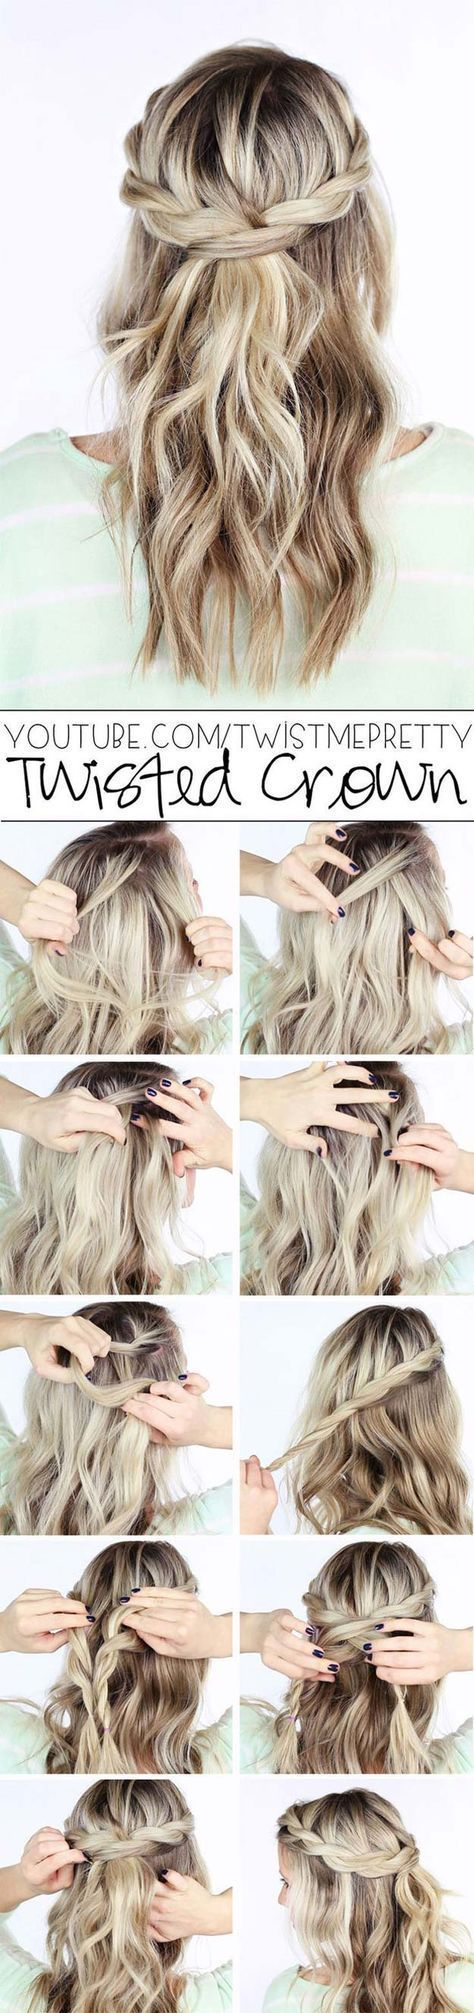 best 25+ long hair hairstyles ideas only on pinterest | hair